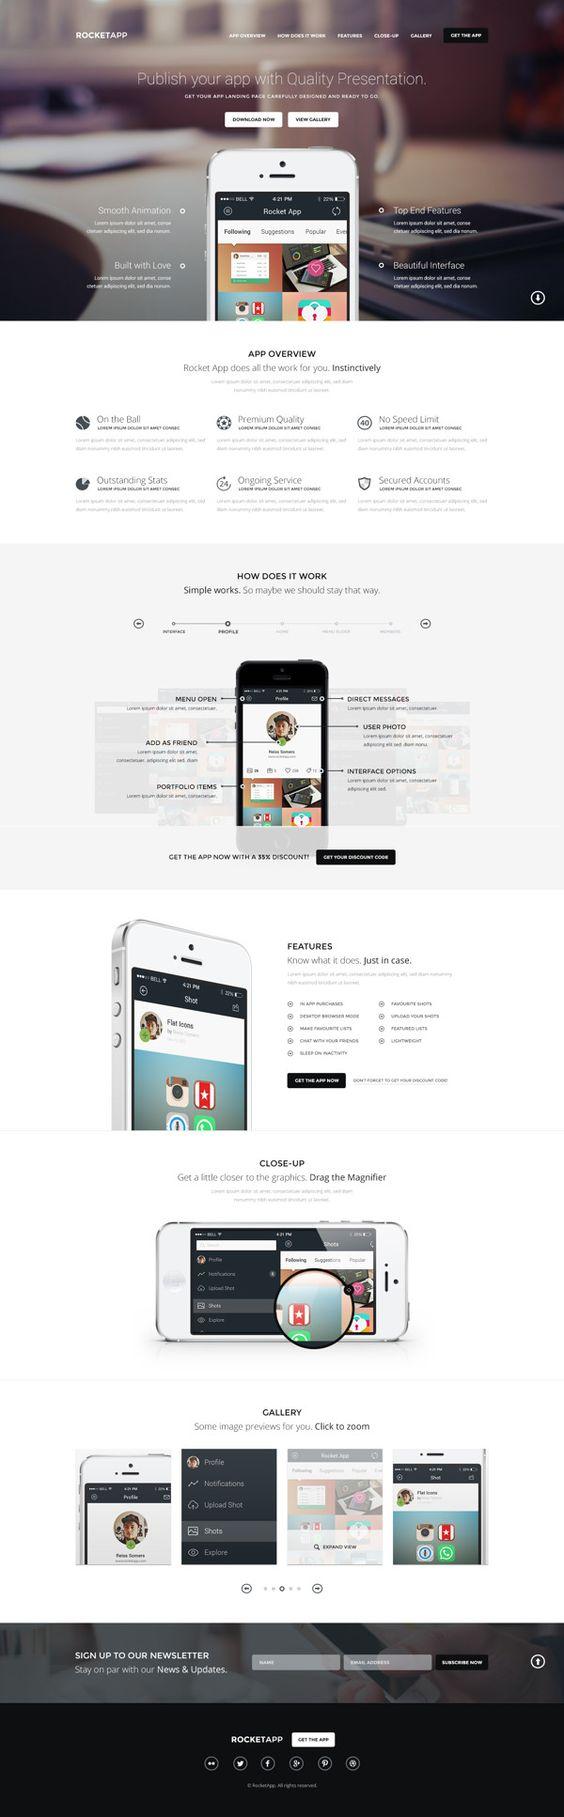 PSD Template - RocketApp Responsive App Landing Page by Nuwan haha, via Behance